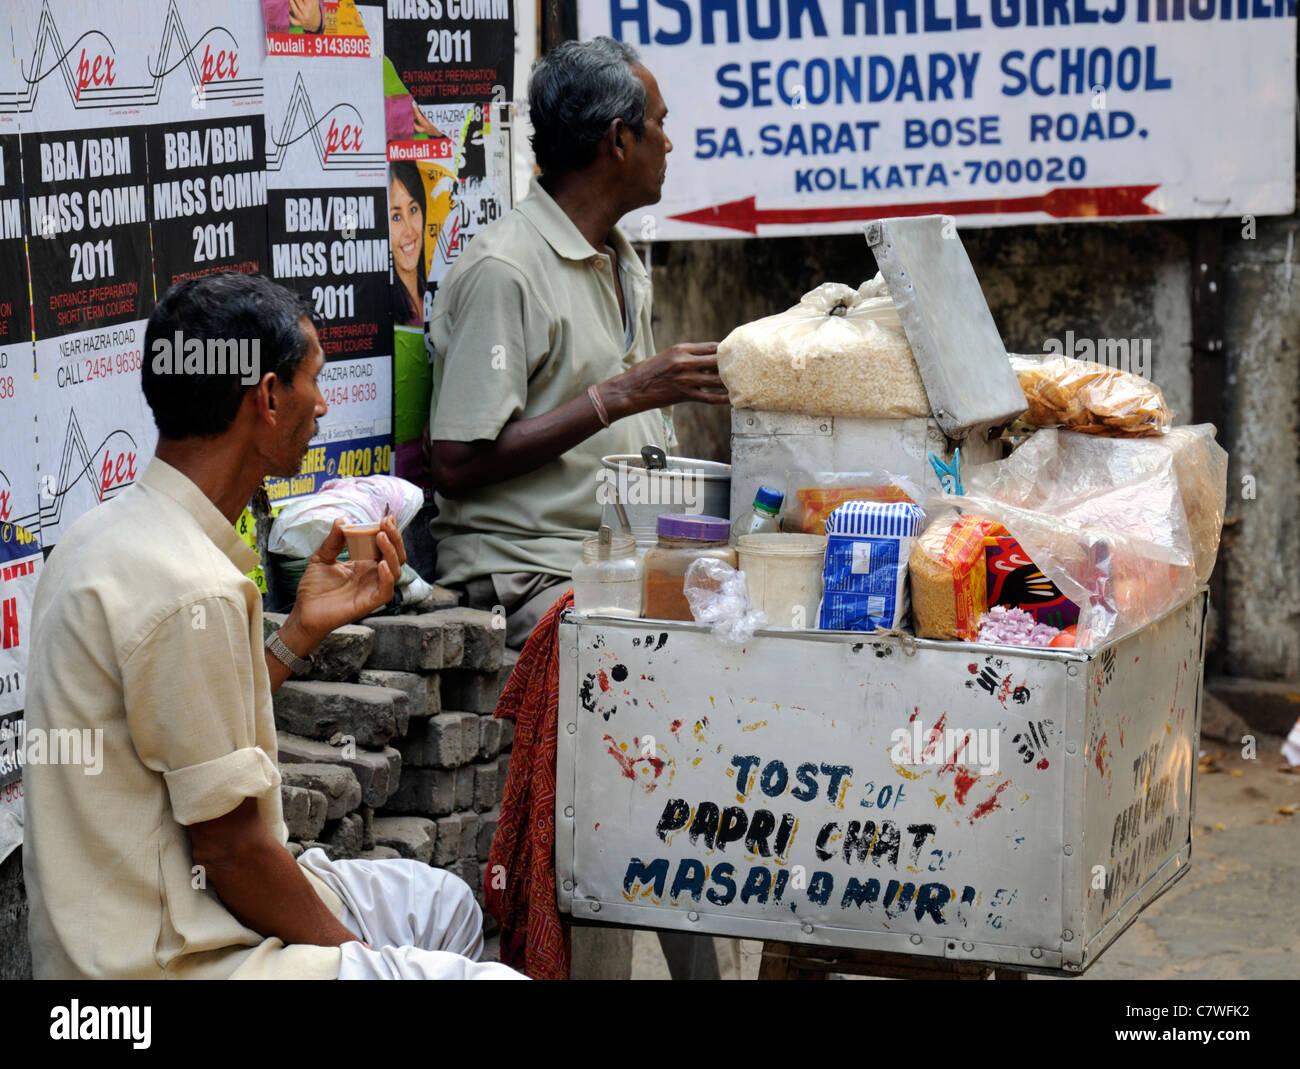 two men drink drinking enjoy enjoying tea chai food stall street stand kolkata calcutta west bengal india - Stock Image